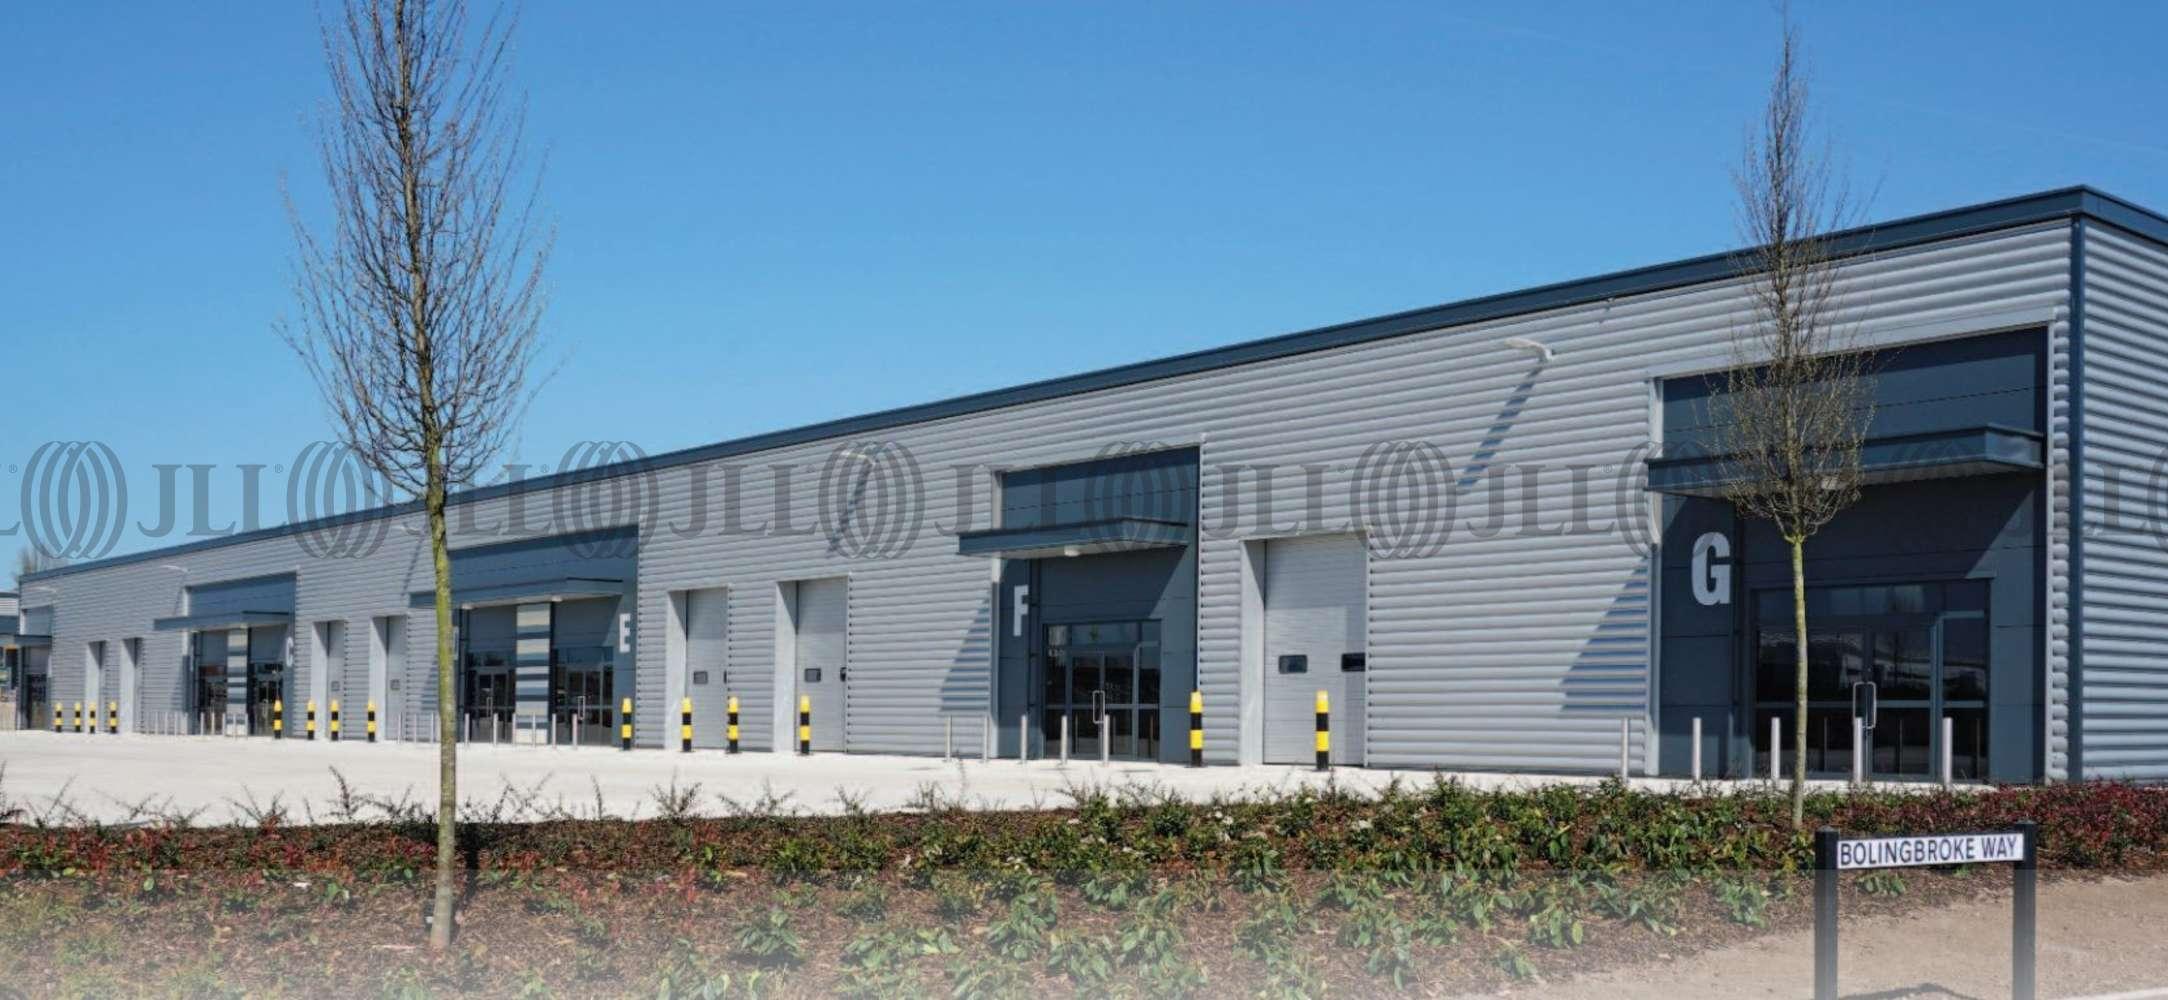 Industrial Bristol, BS34 7QB - Trade Unit F Horizon 38 - 77857